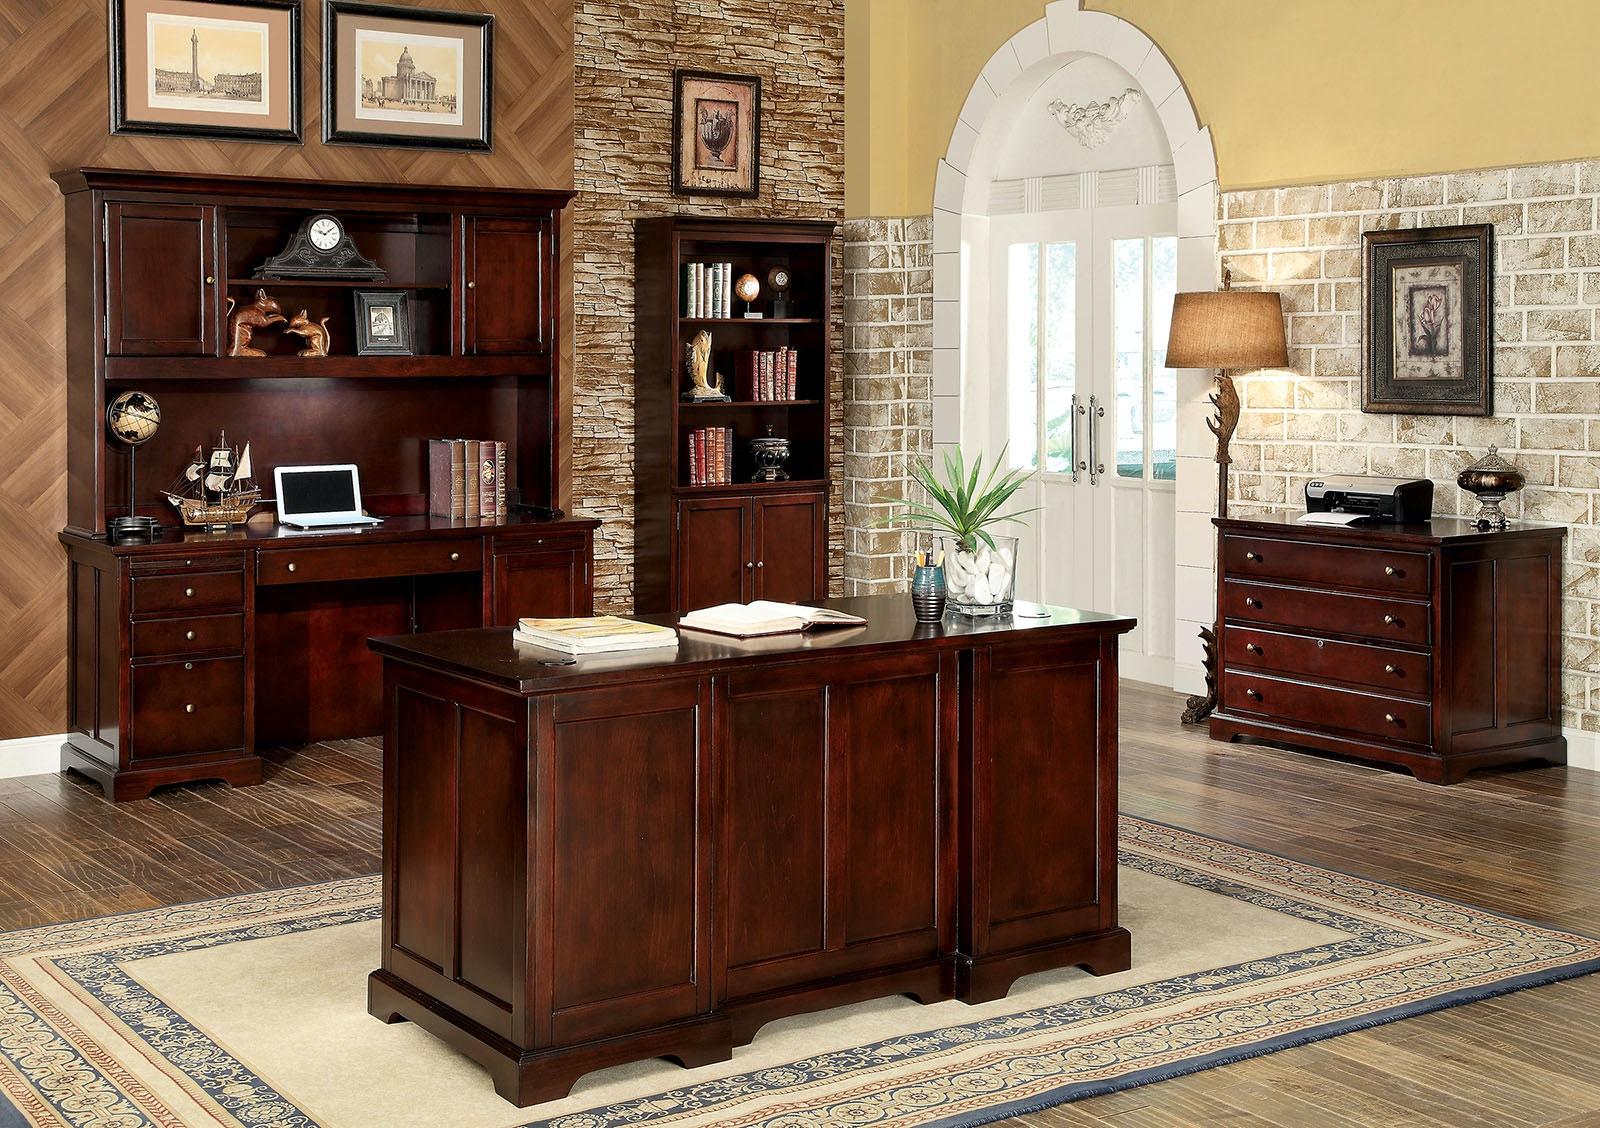 Furniture Of America Office Desk, Cherry CM DK6207D